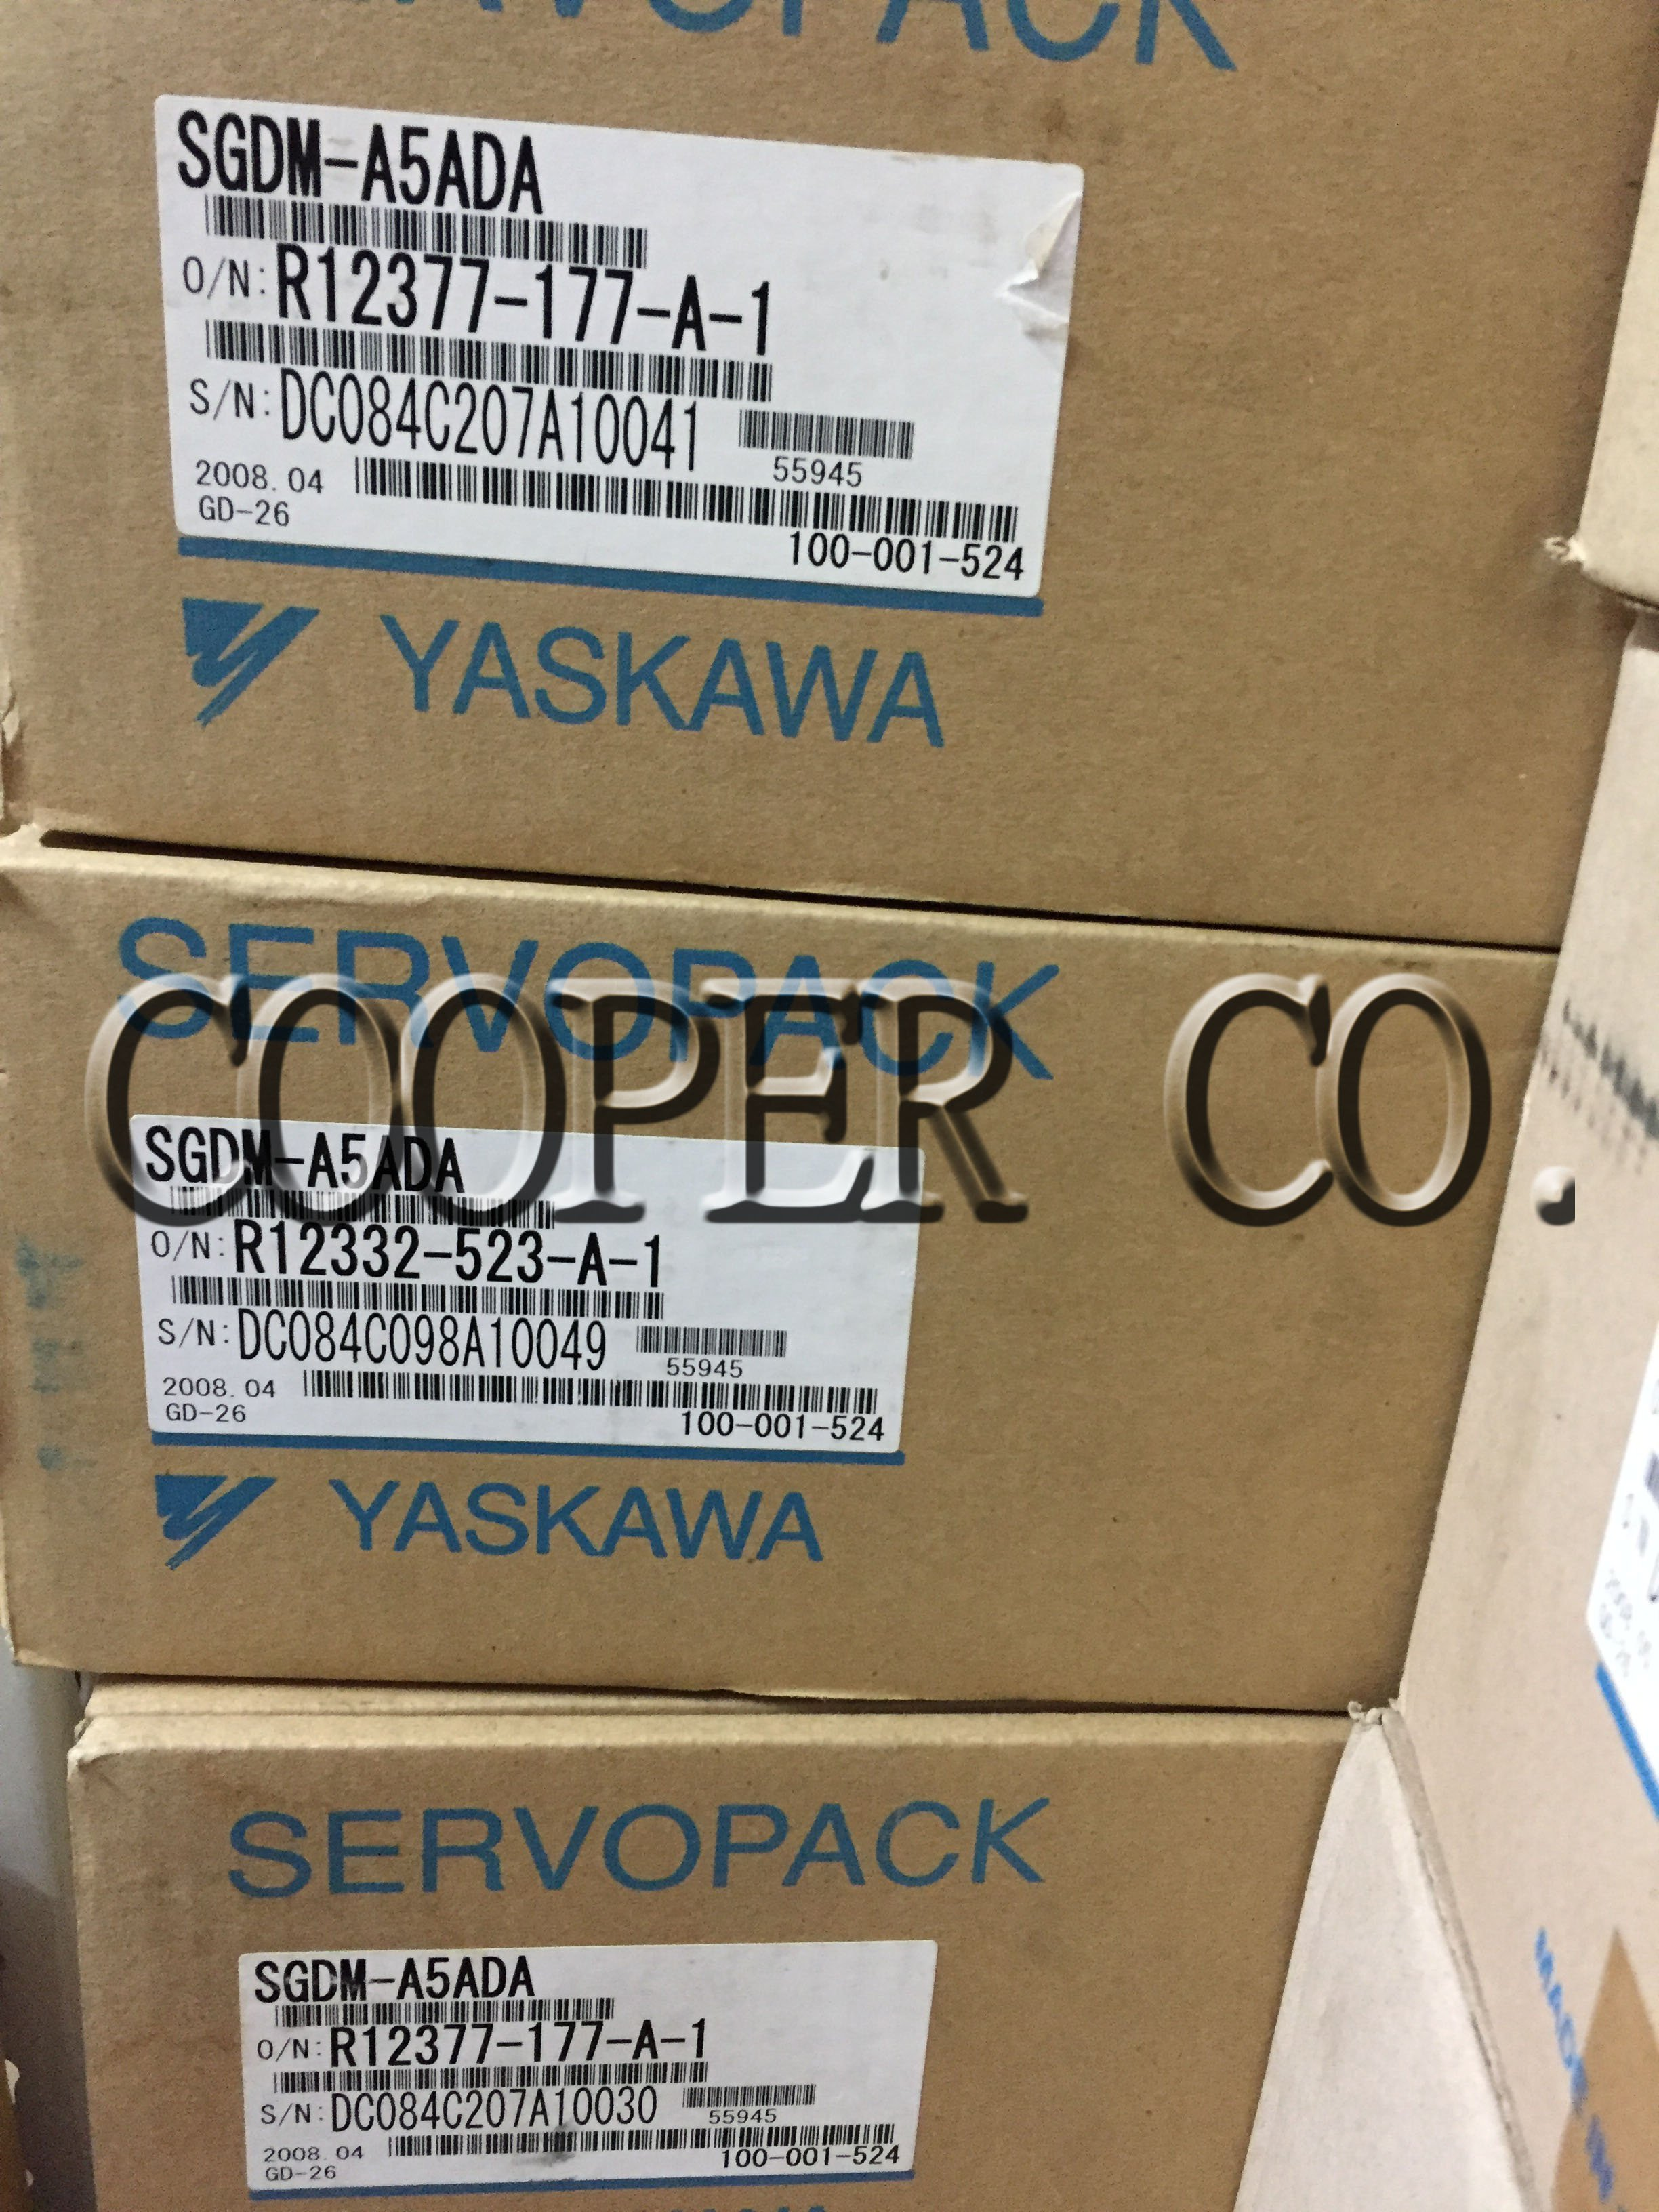 YASKAWA SERVOPACK SGDM-A5ADA 伺服驅動控制器停產品中古全新品現貨銷售維修